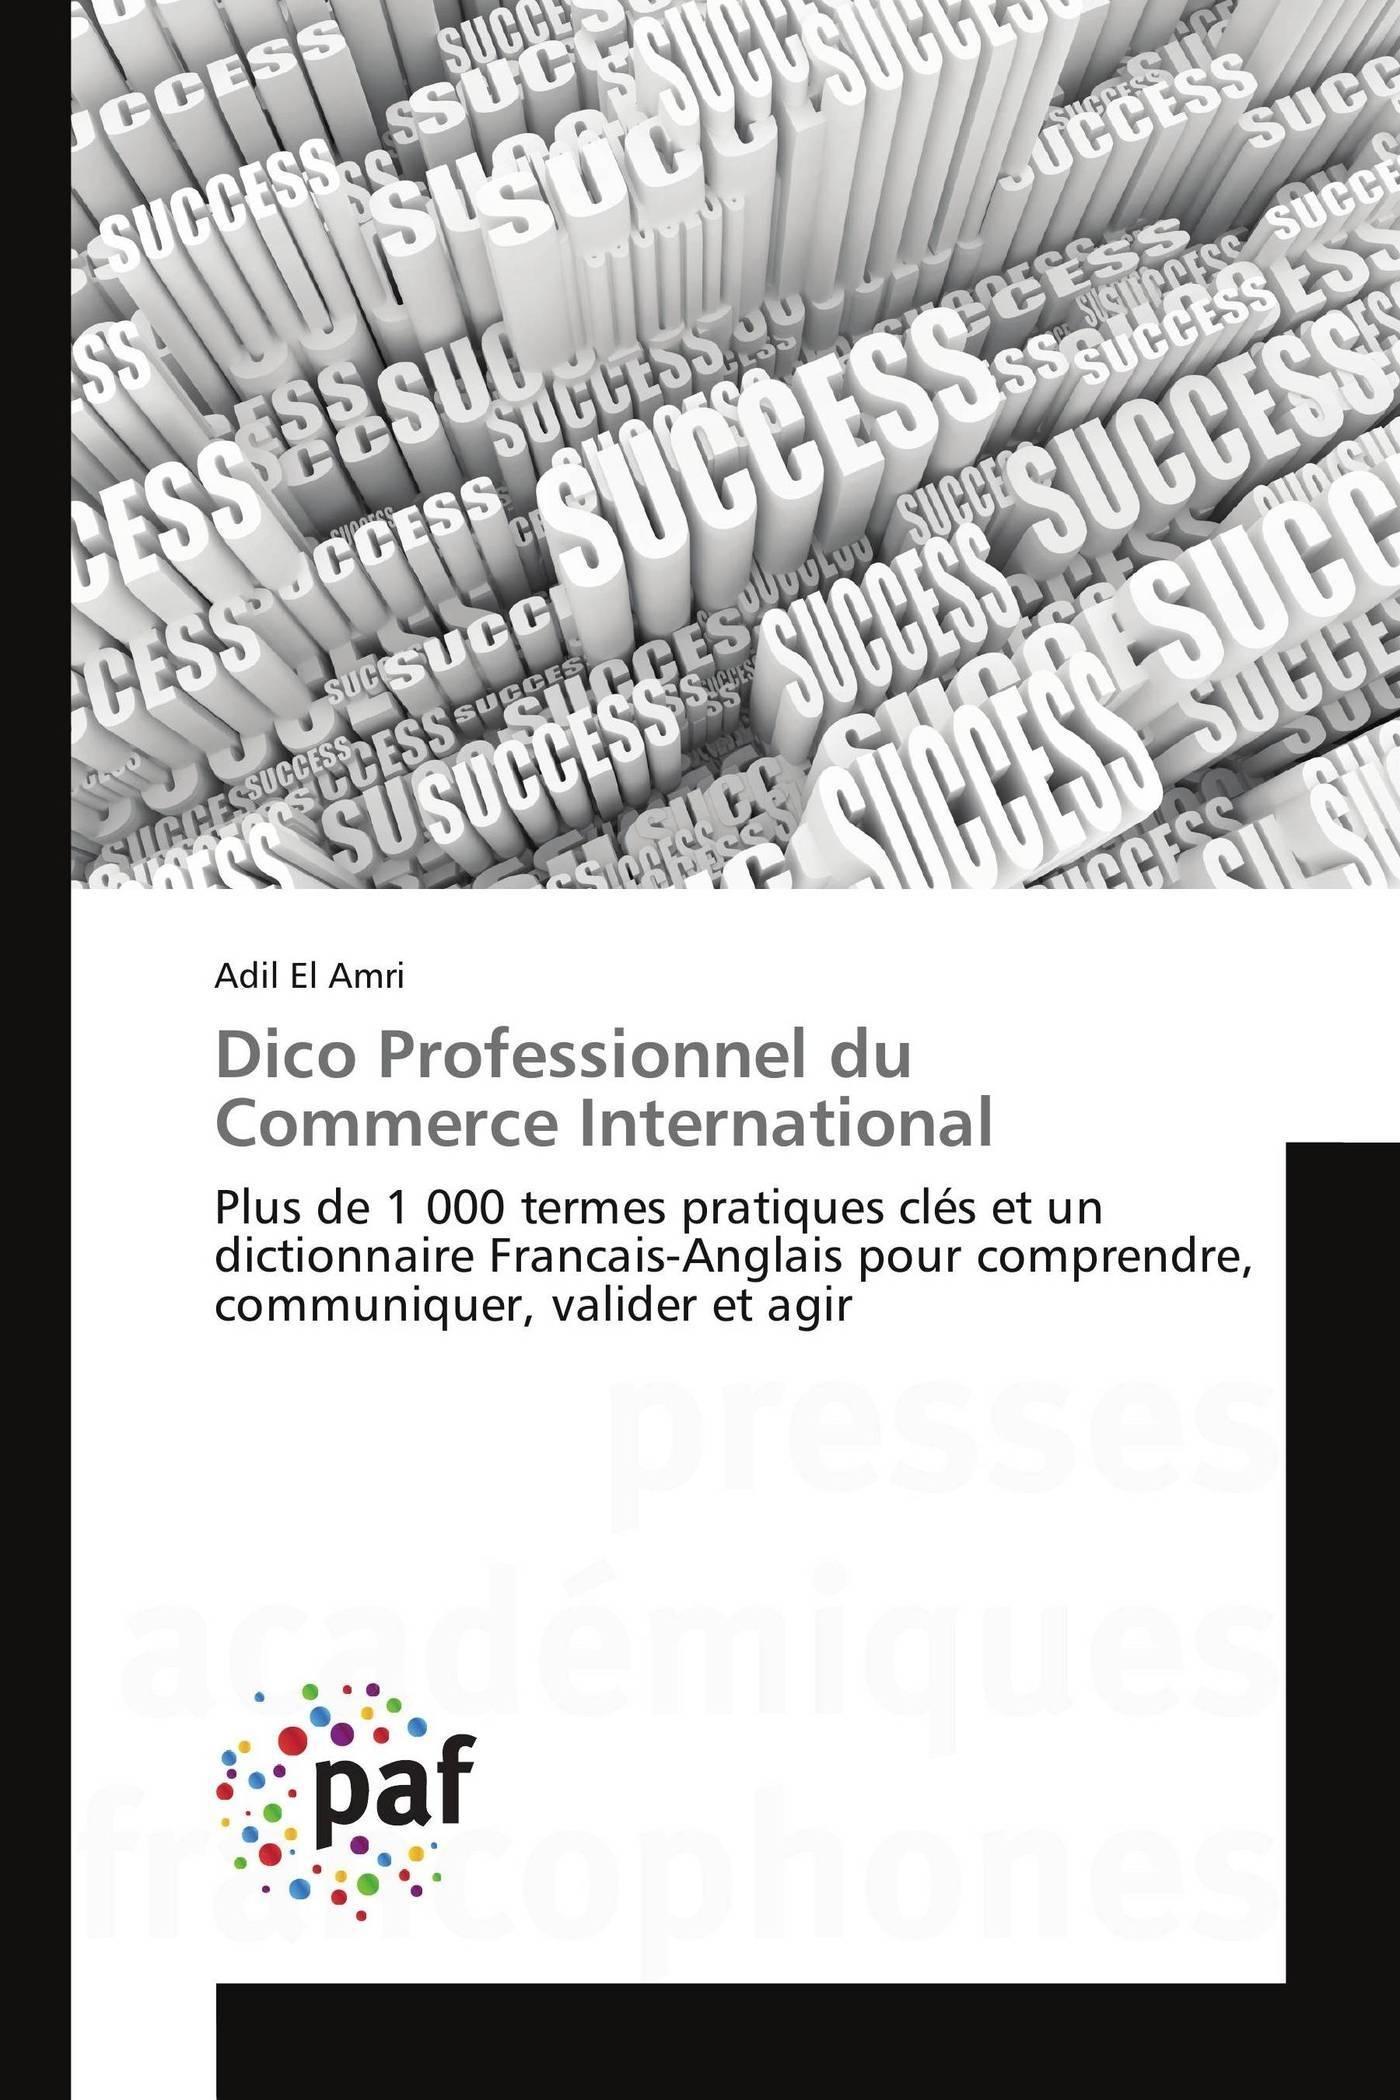 DICO PROFESSIONNEL DU COMMERCE INTERNATIONAL